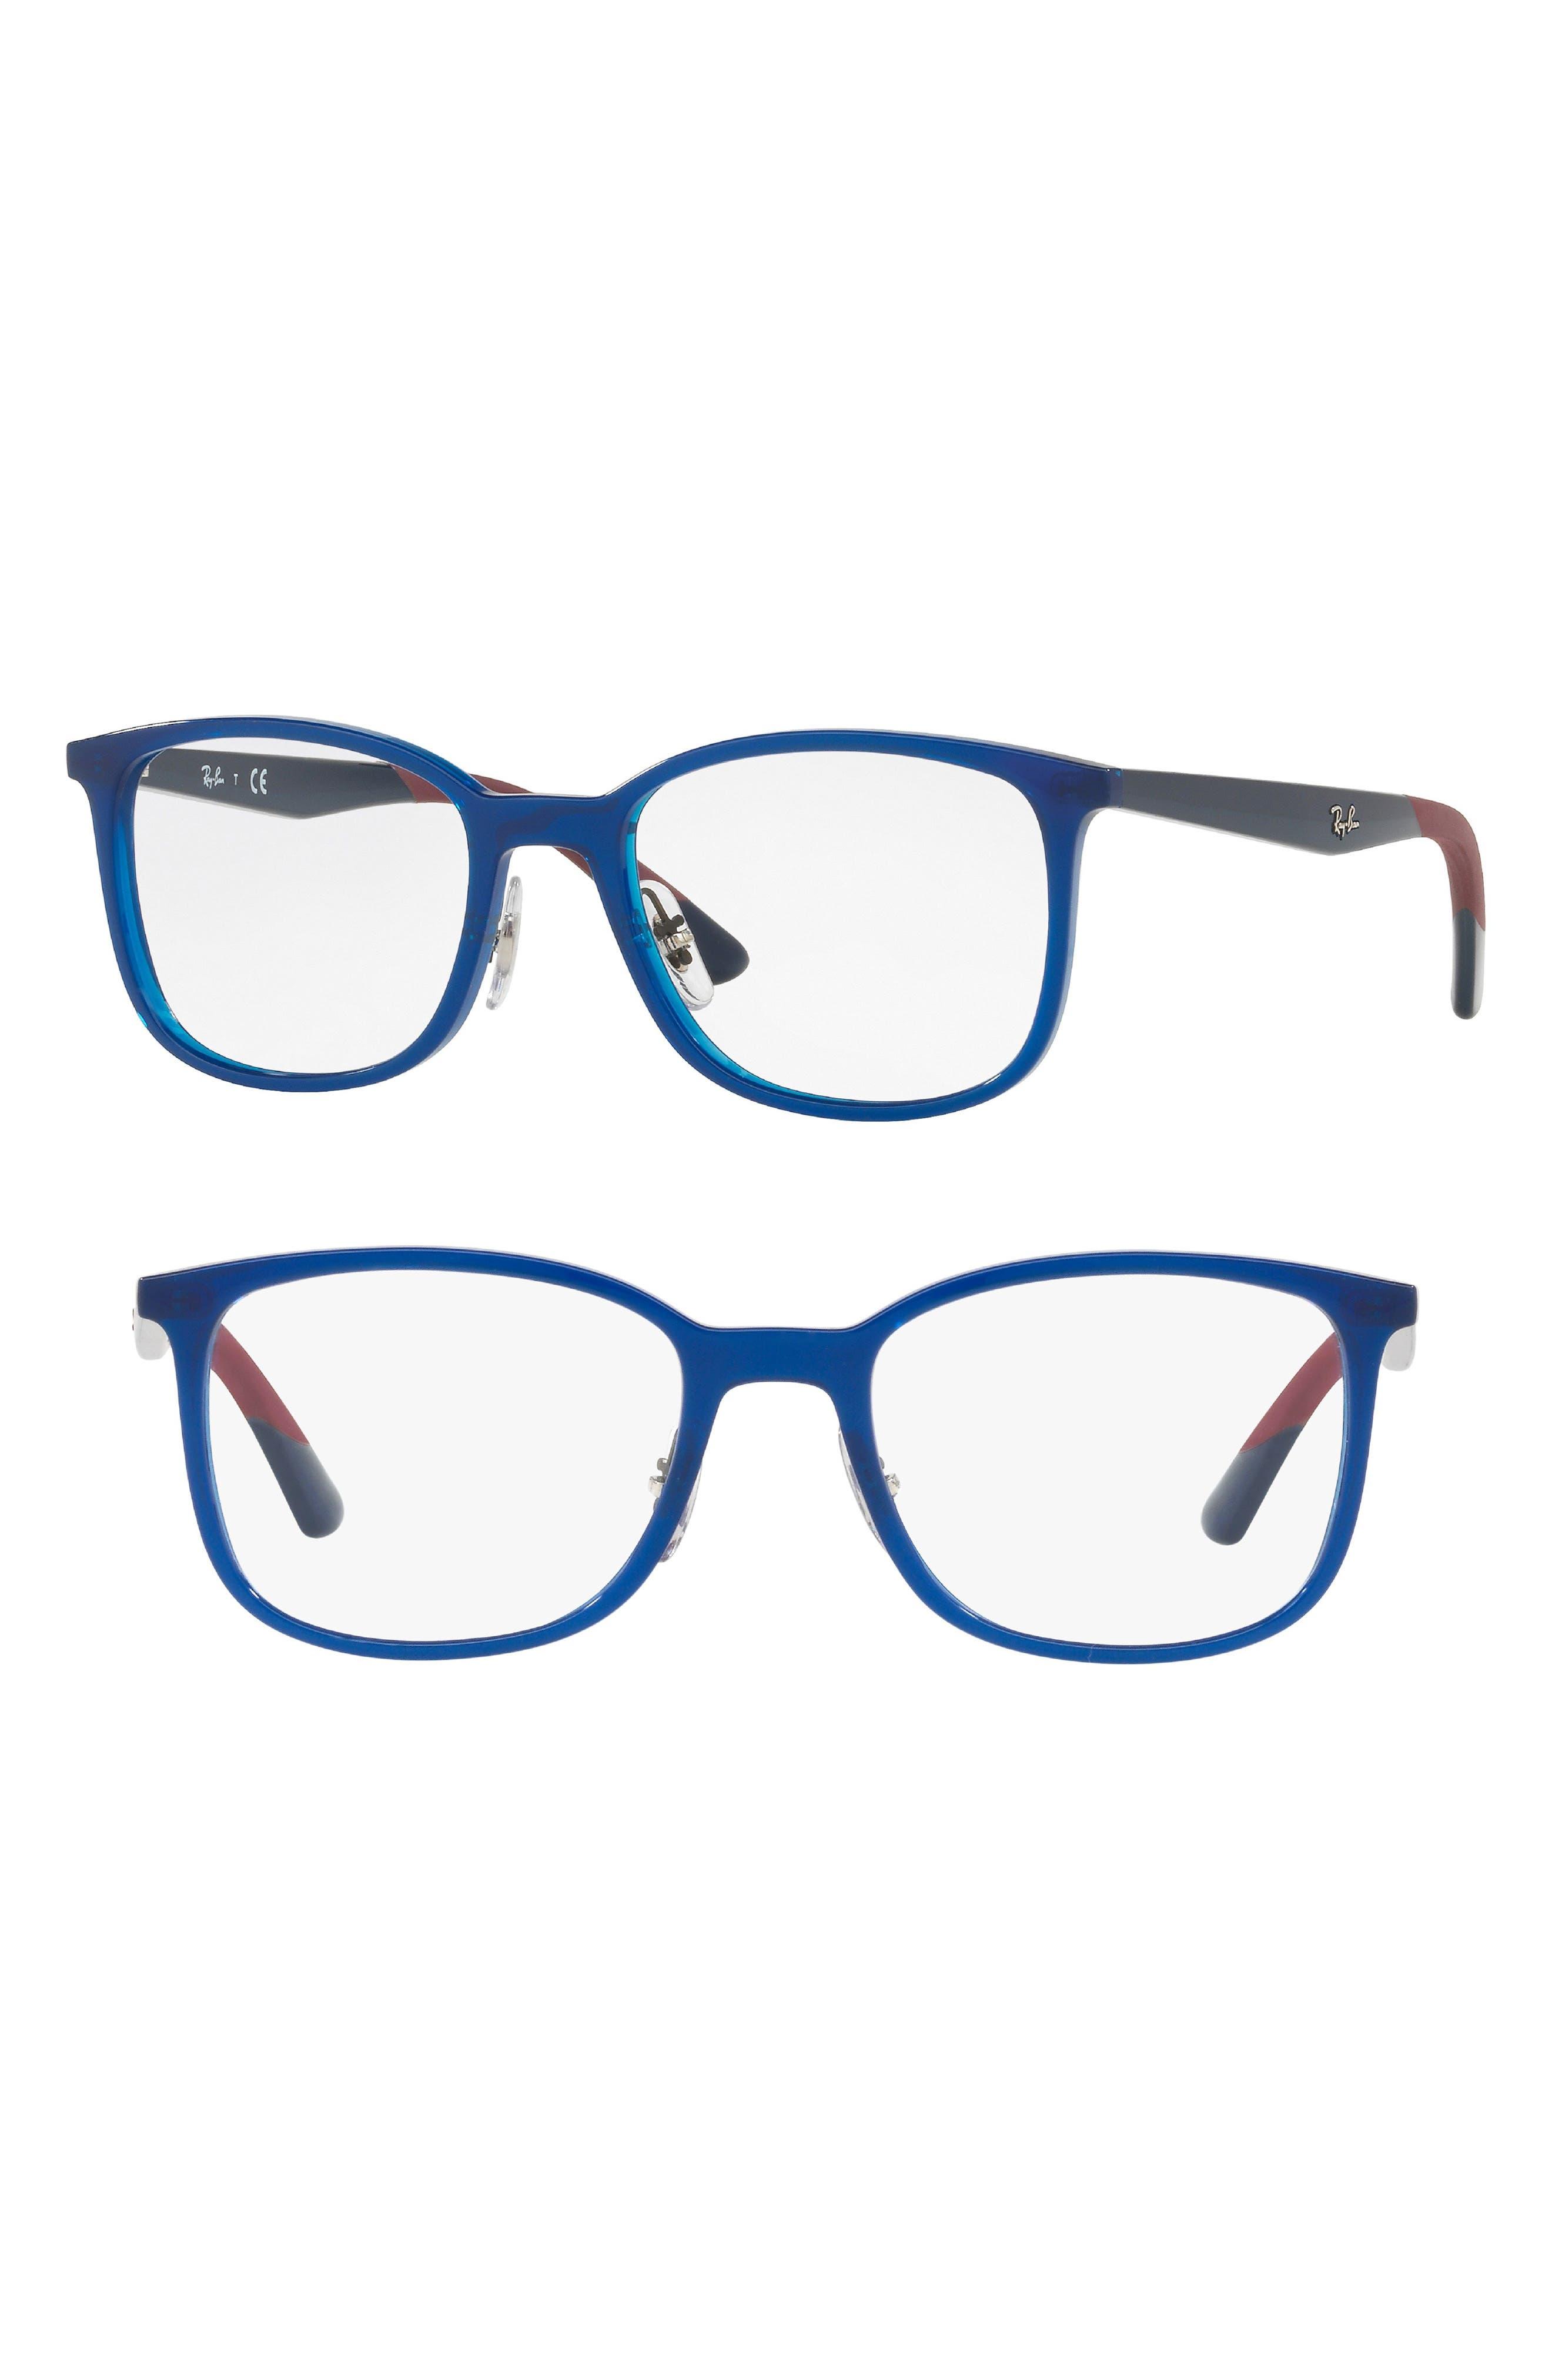 Ray-Ban 7142 52mm Optical Glasses